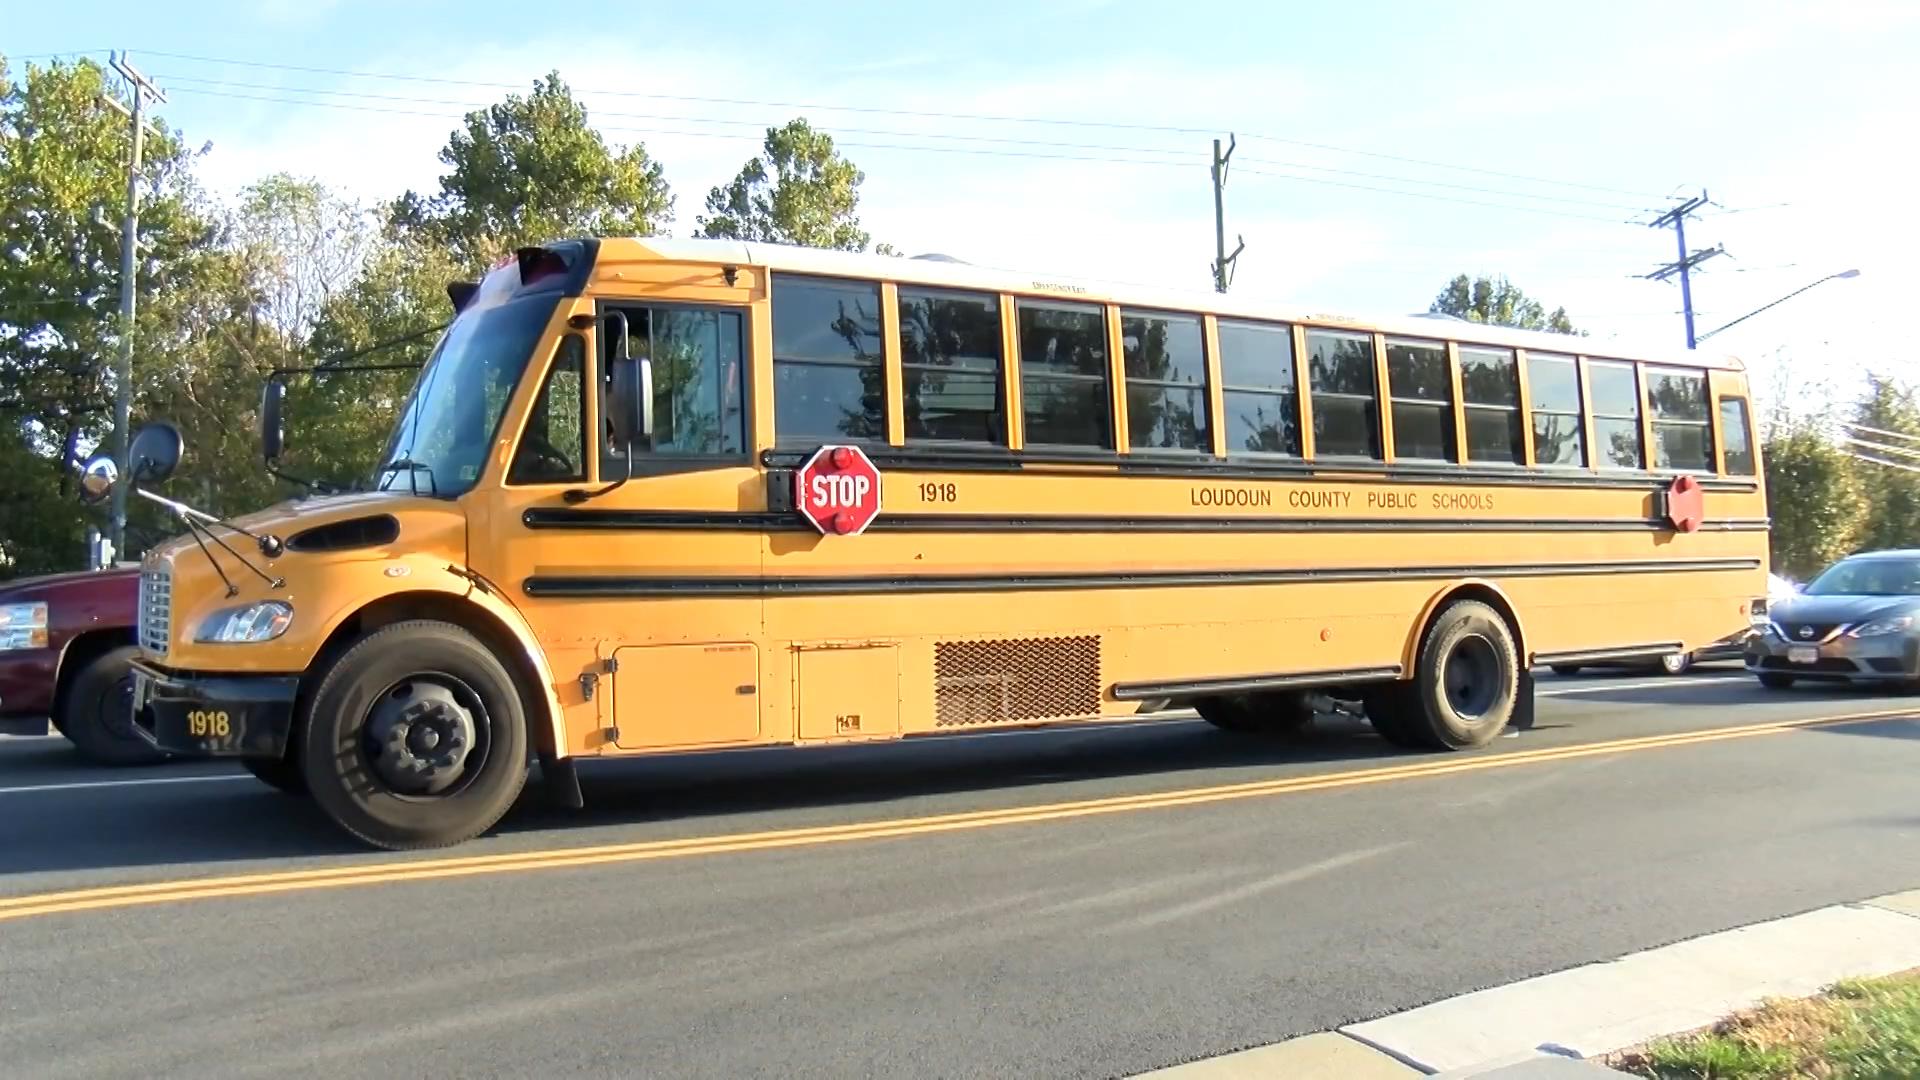 Loudoun County Public Schools Calendar 2022.Virginia Ag S Office Says Loudoun County Public Schools Must Reform Gifted Programs Admissions Wdvm25 Dcw50 Washington Dc